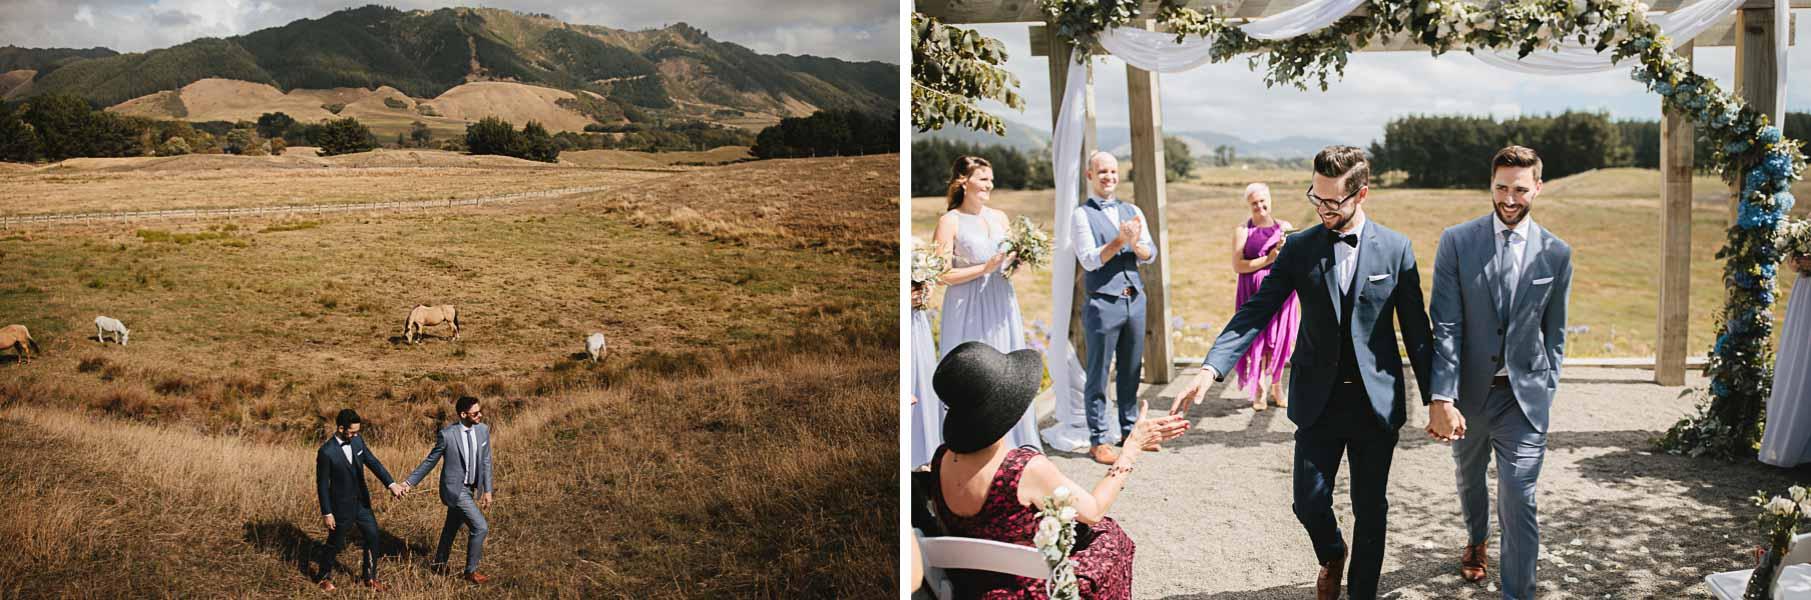 BYO wedding venues wellington